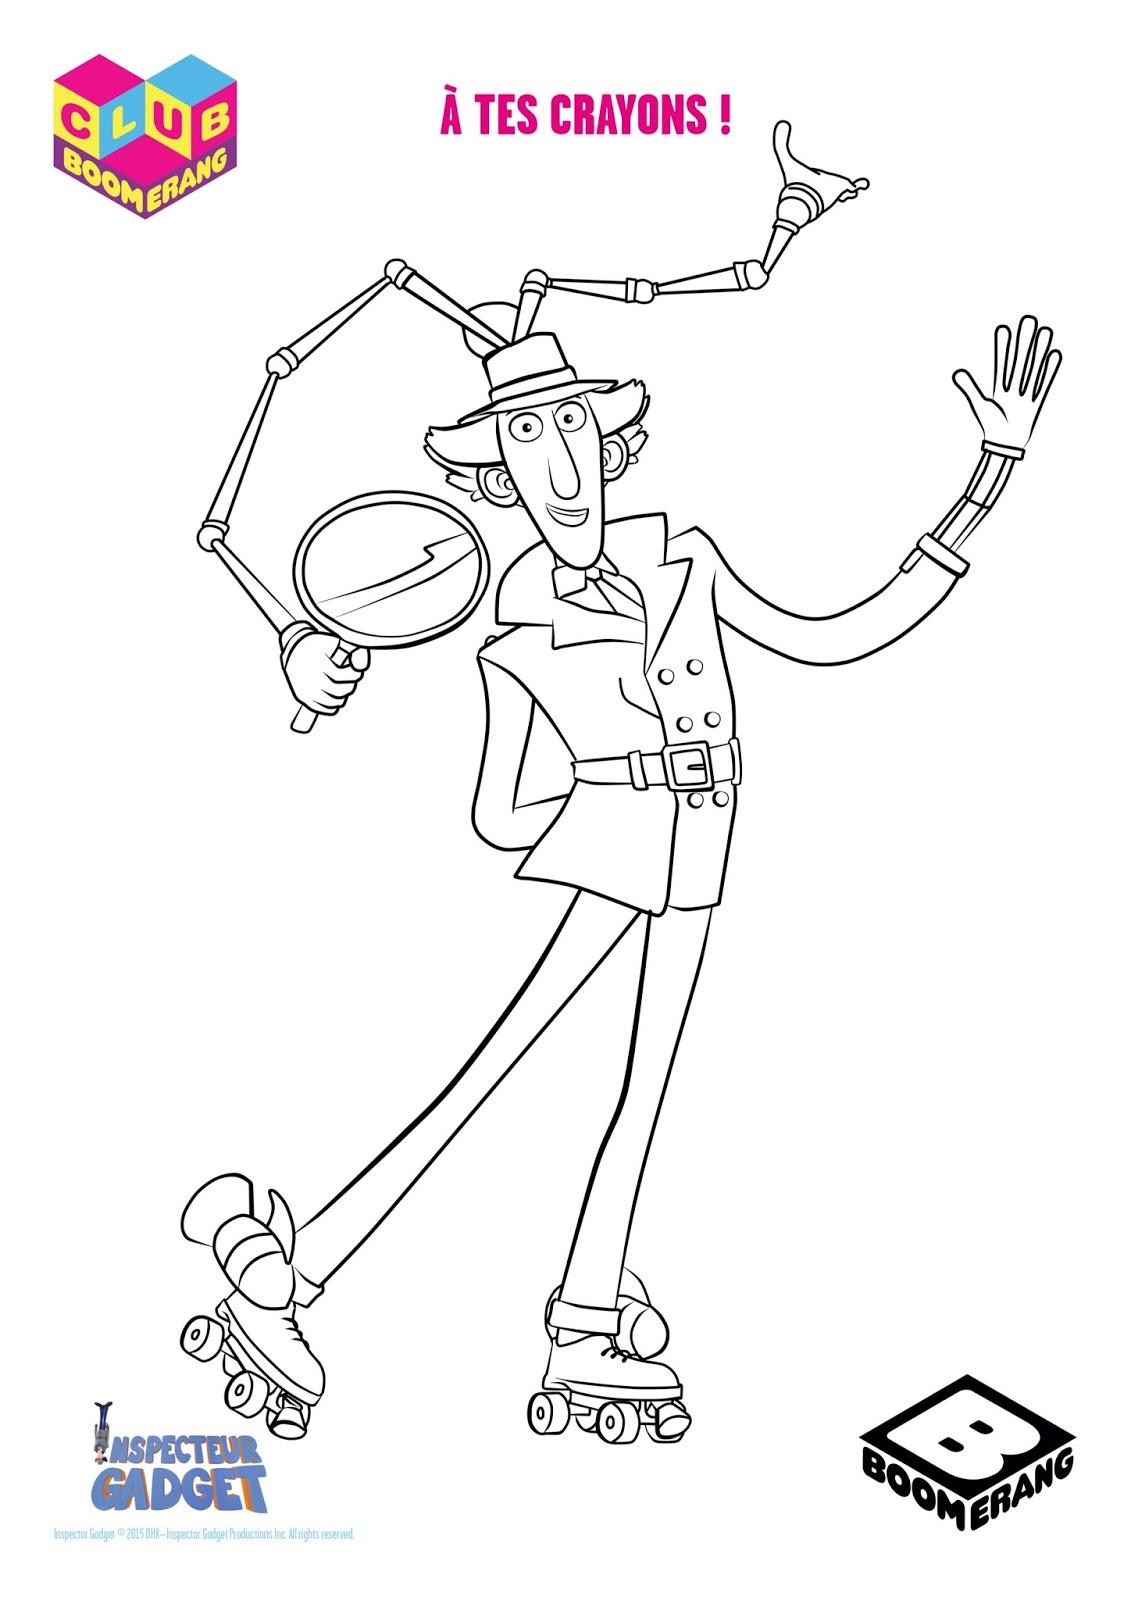 Worksheet. Inspector Gadget Blog Fan AdelanteGadgetoblog Go Go Gadget Colour